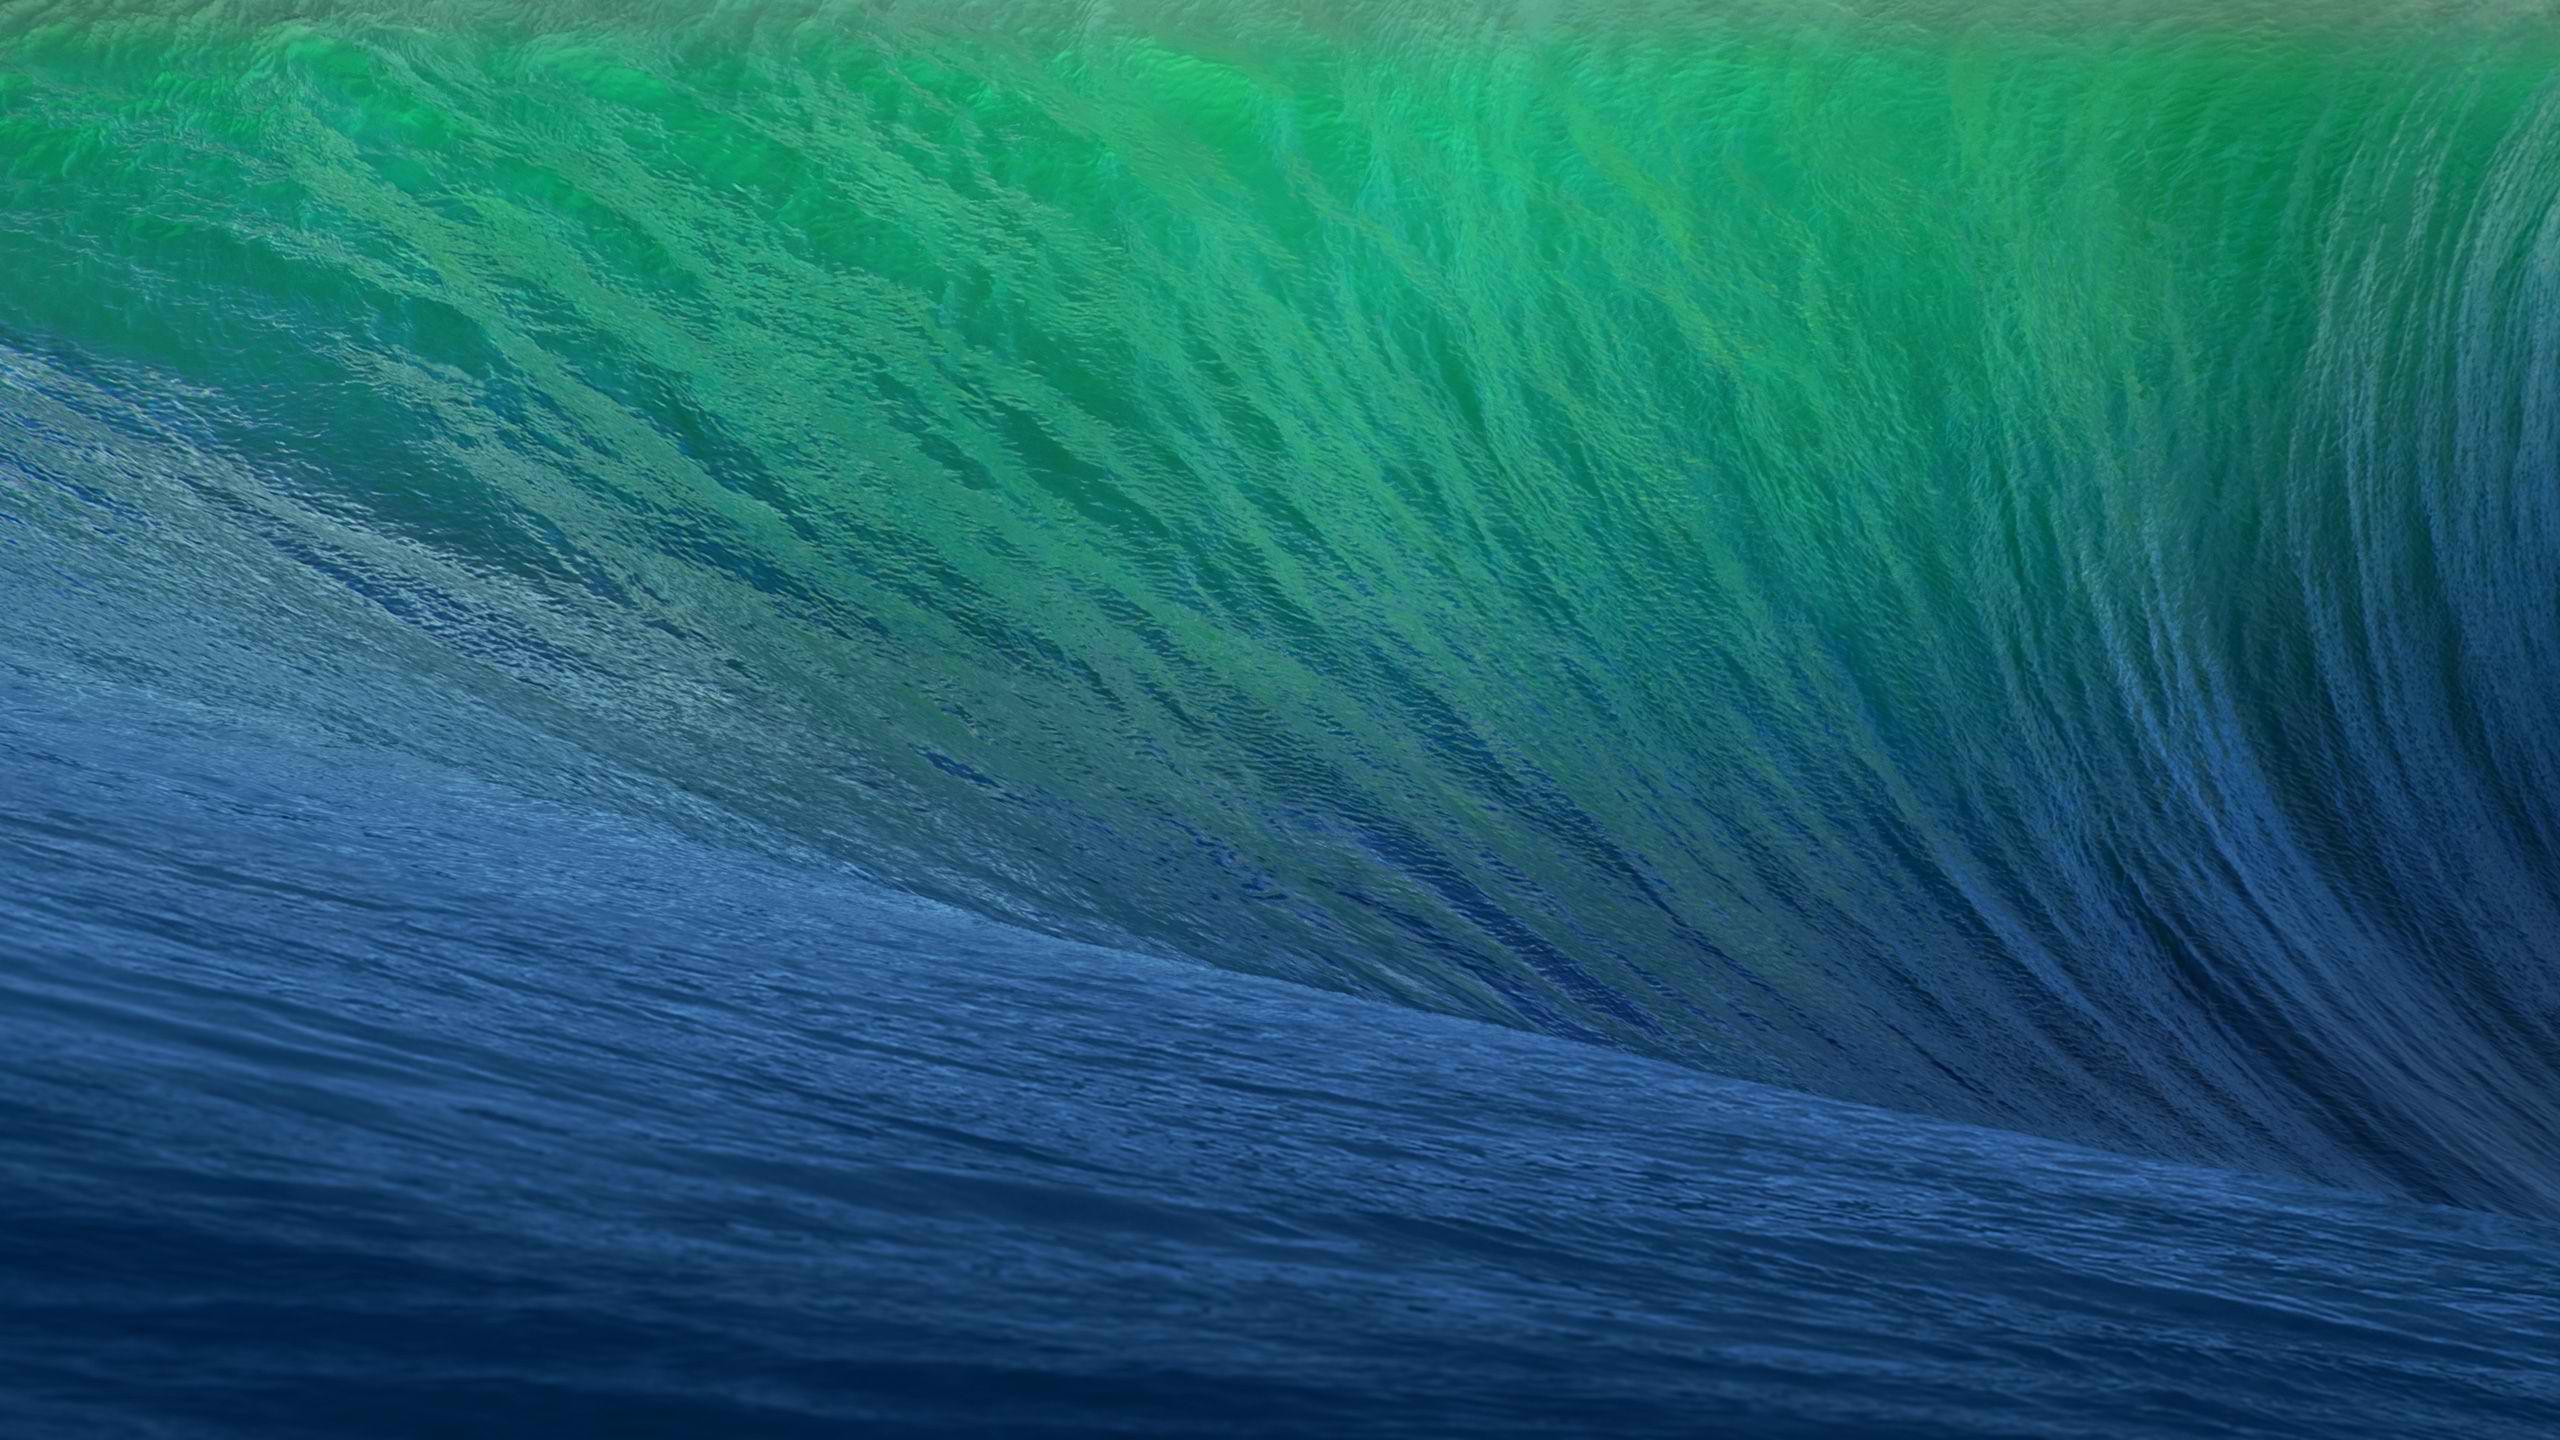 Ocean Wave full Retina ready HD wallpaper 5120 x 2880 HERE 2560x1440